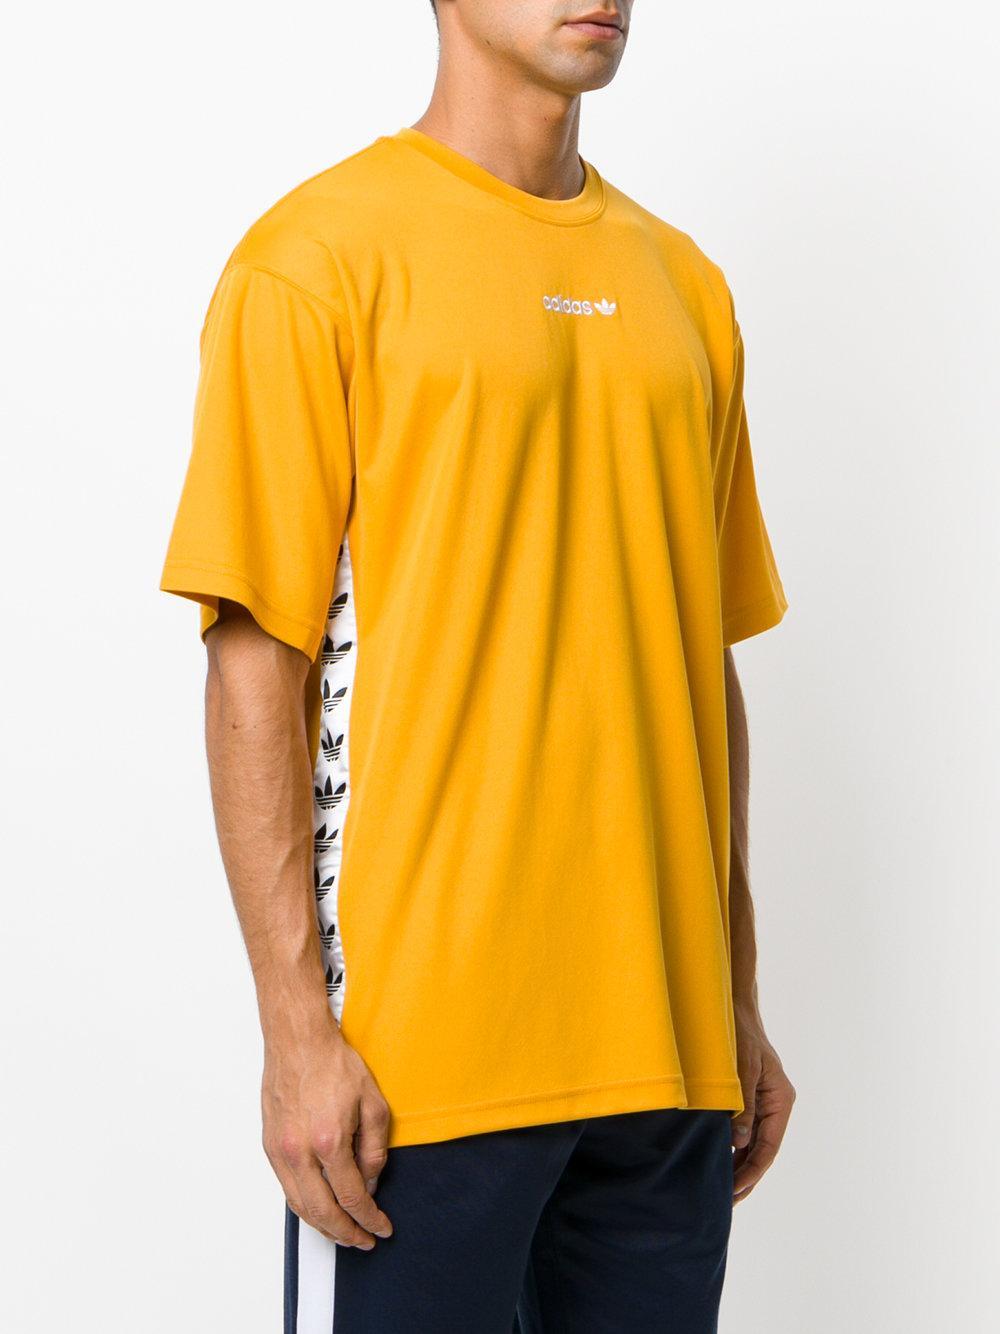 Lyst Adidas Originals Tnt Tape T Shirt In Yellow For Men